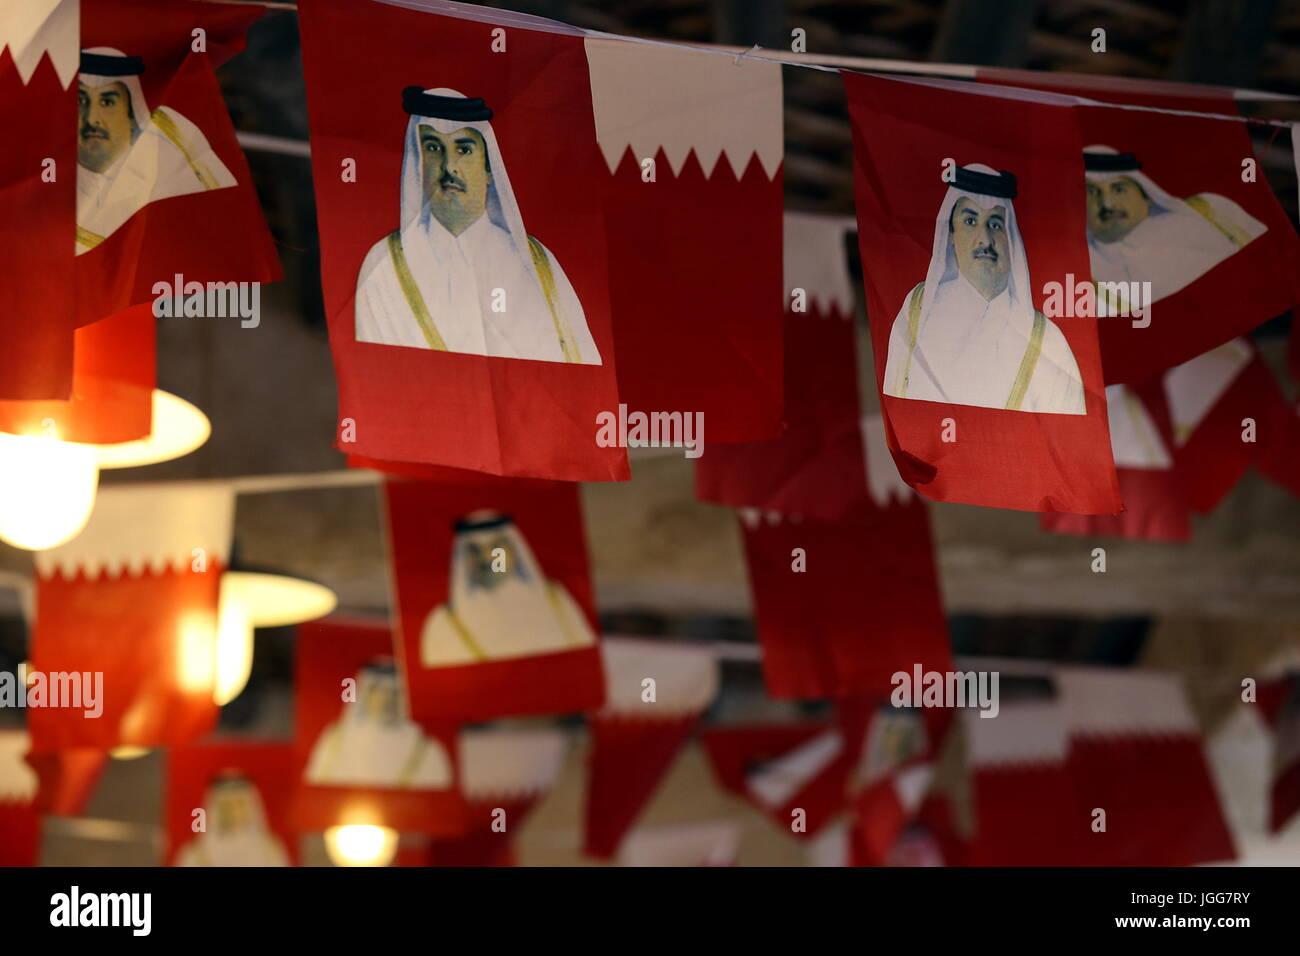 DOHA, QATAR - JULY 6, 2017: Ntional flags printed with images of Qatari Emir Sheikh Tamim bin Hamad al-Thani are Stock Photo